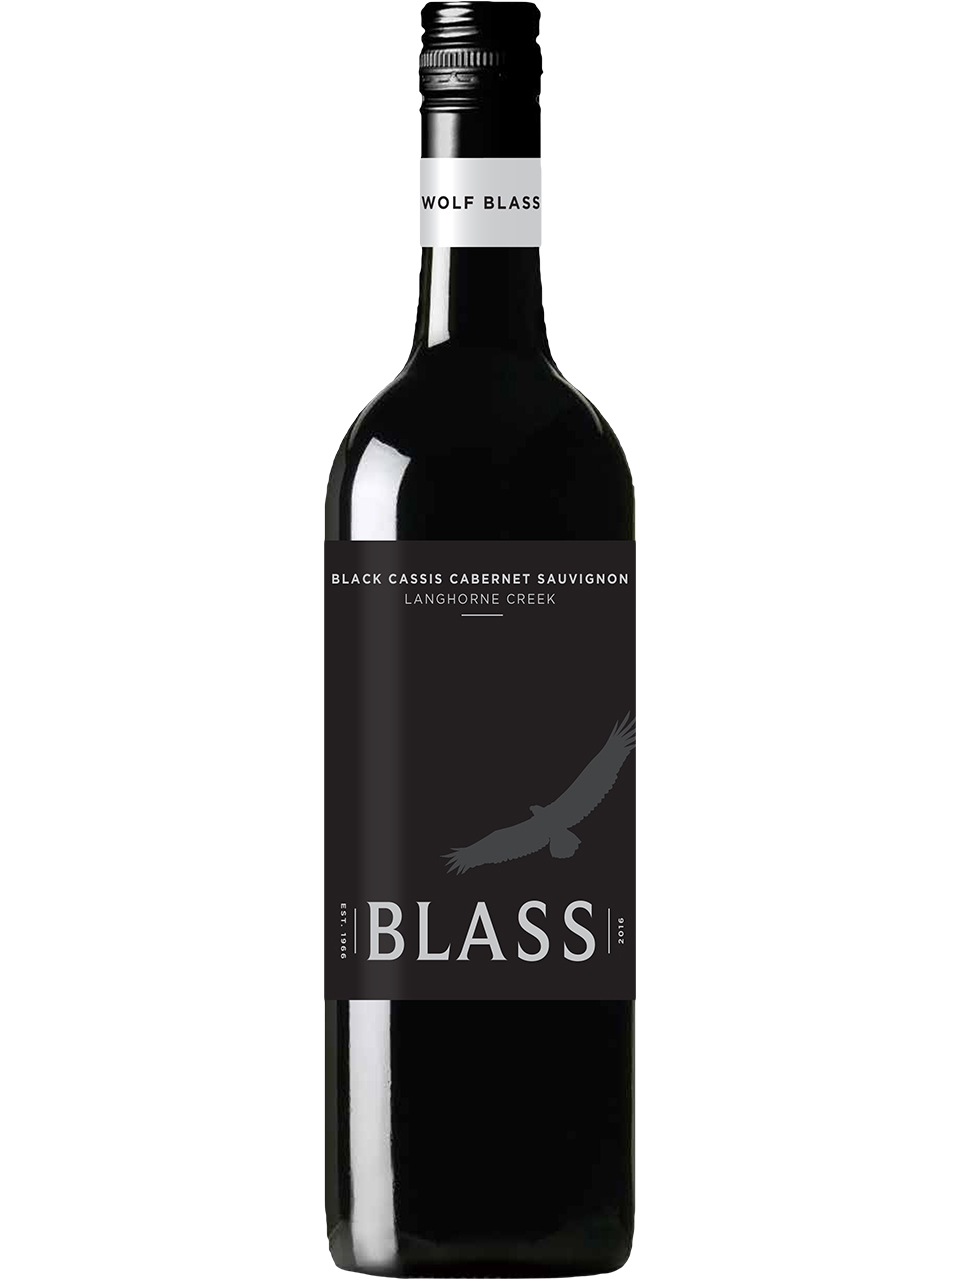 Wolf Blass Black Spice Cabernet Sauvignon